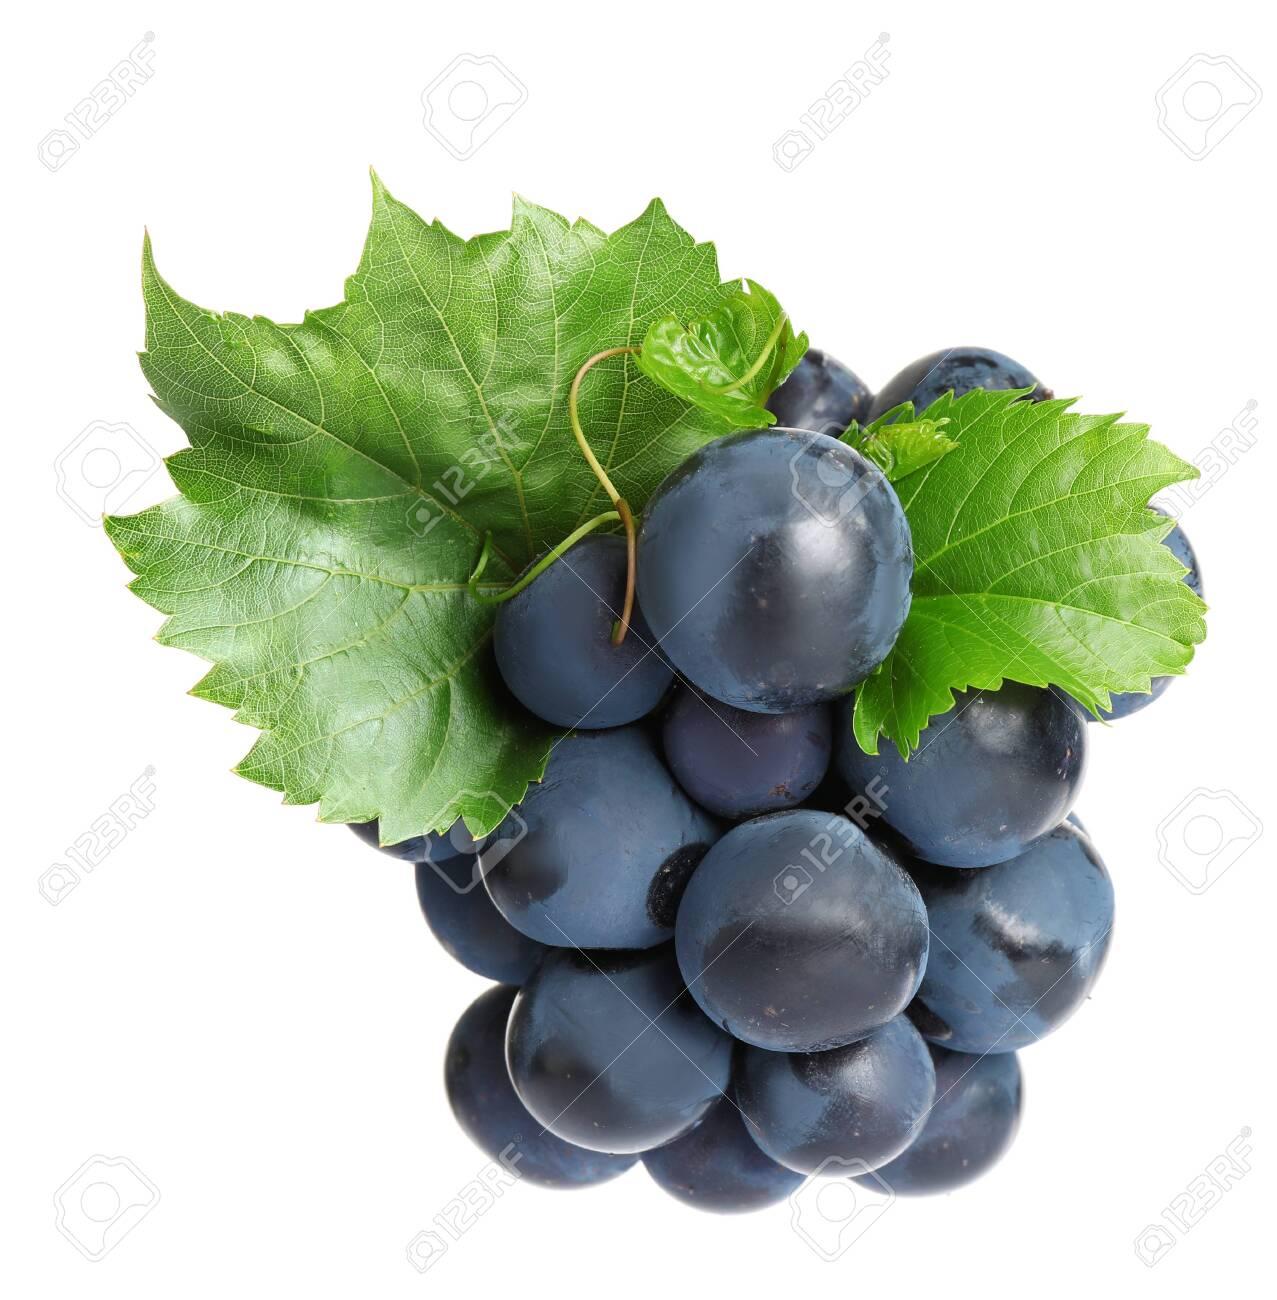 Fresh ripe juicy black grapes isolated on white - 130388242